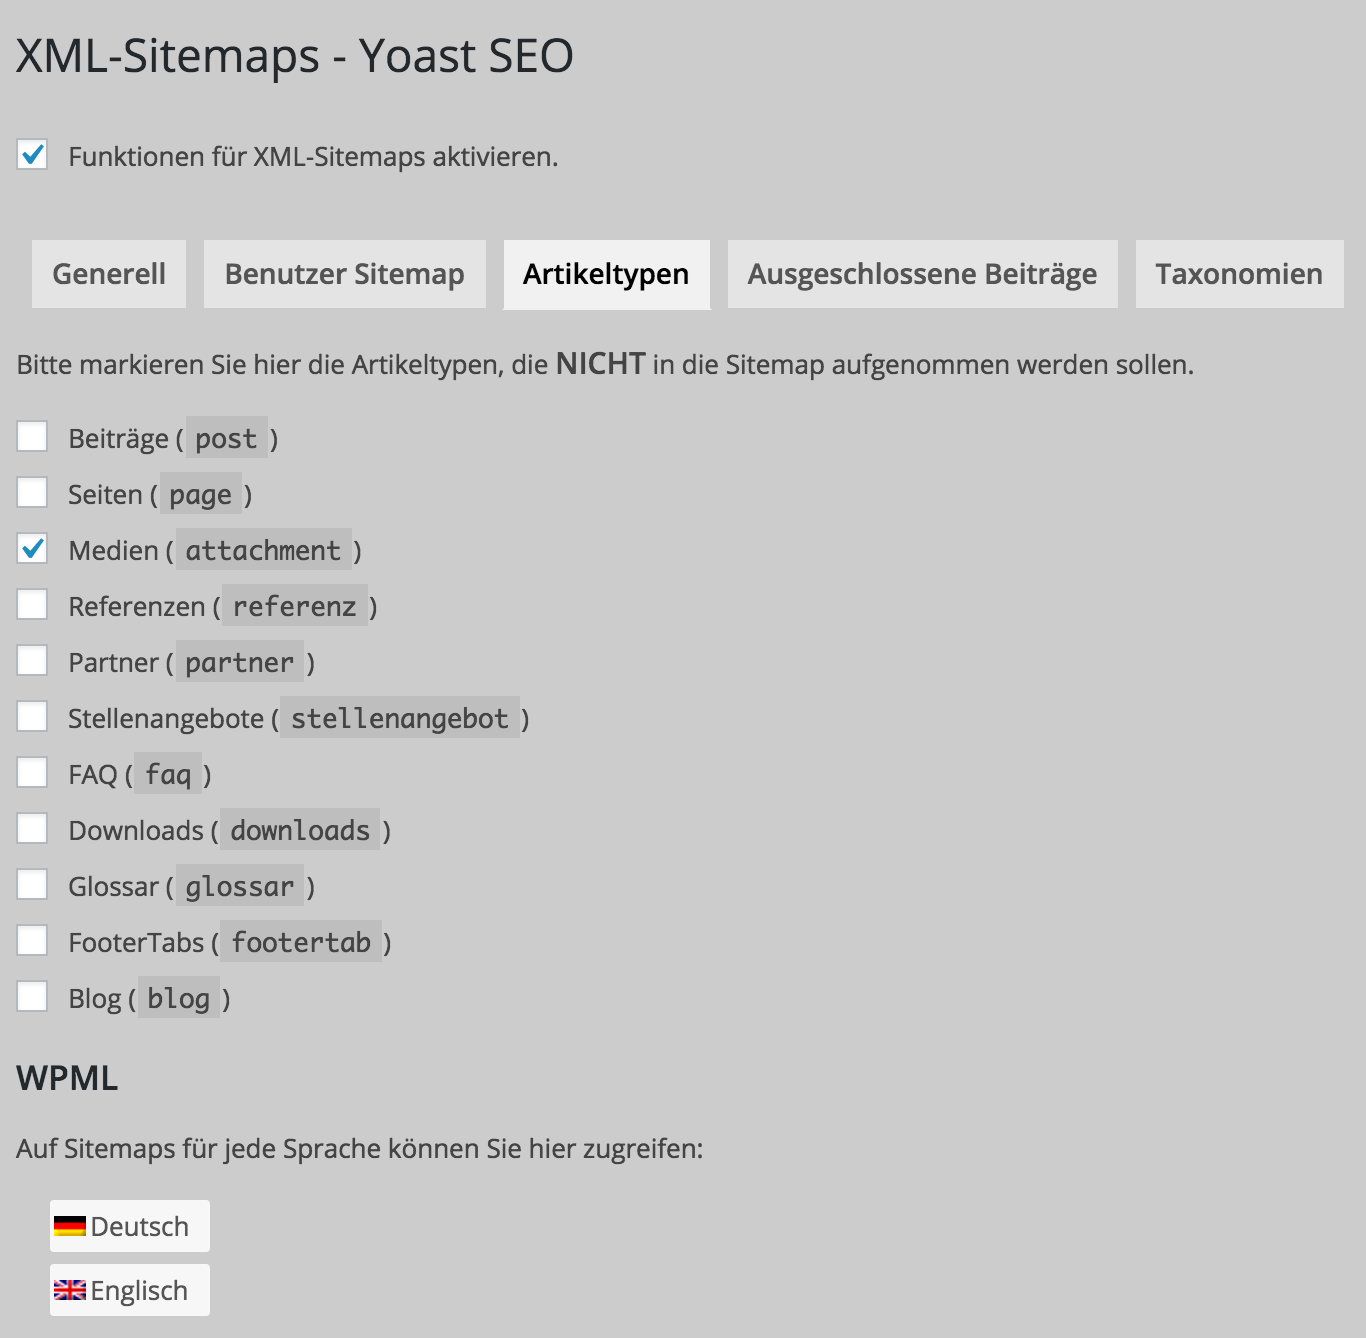 wpml yoast seo sitemap exclude different custom post types per